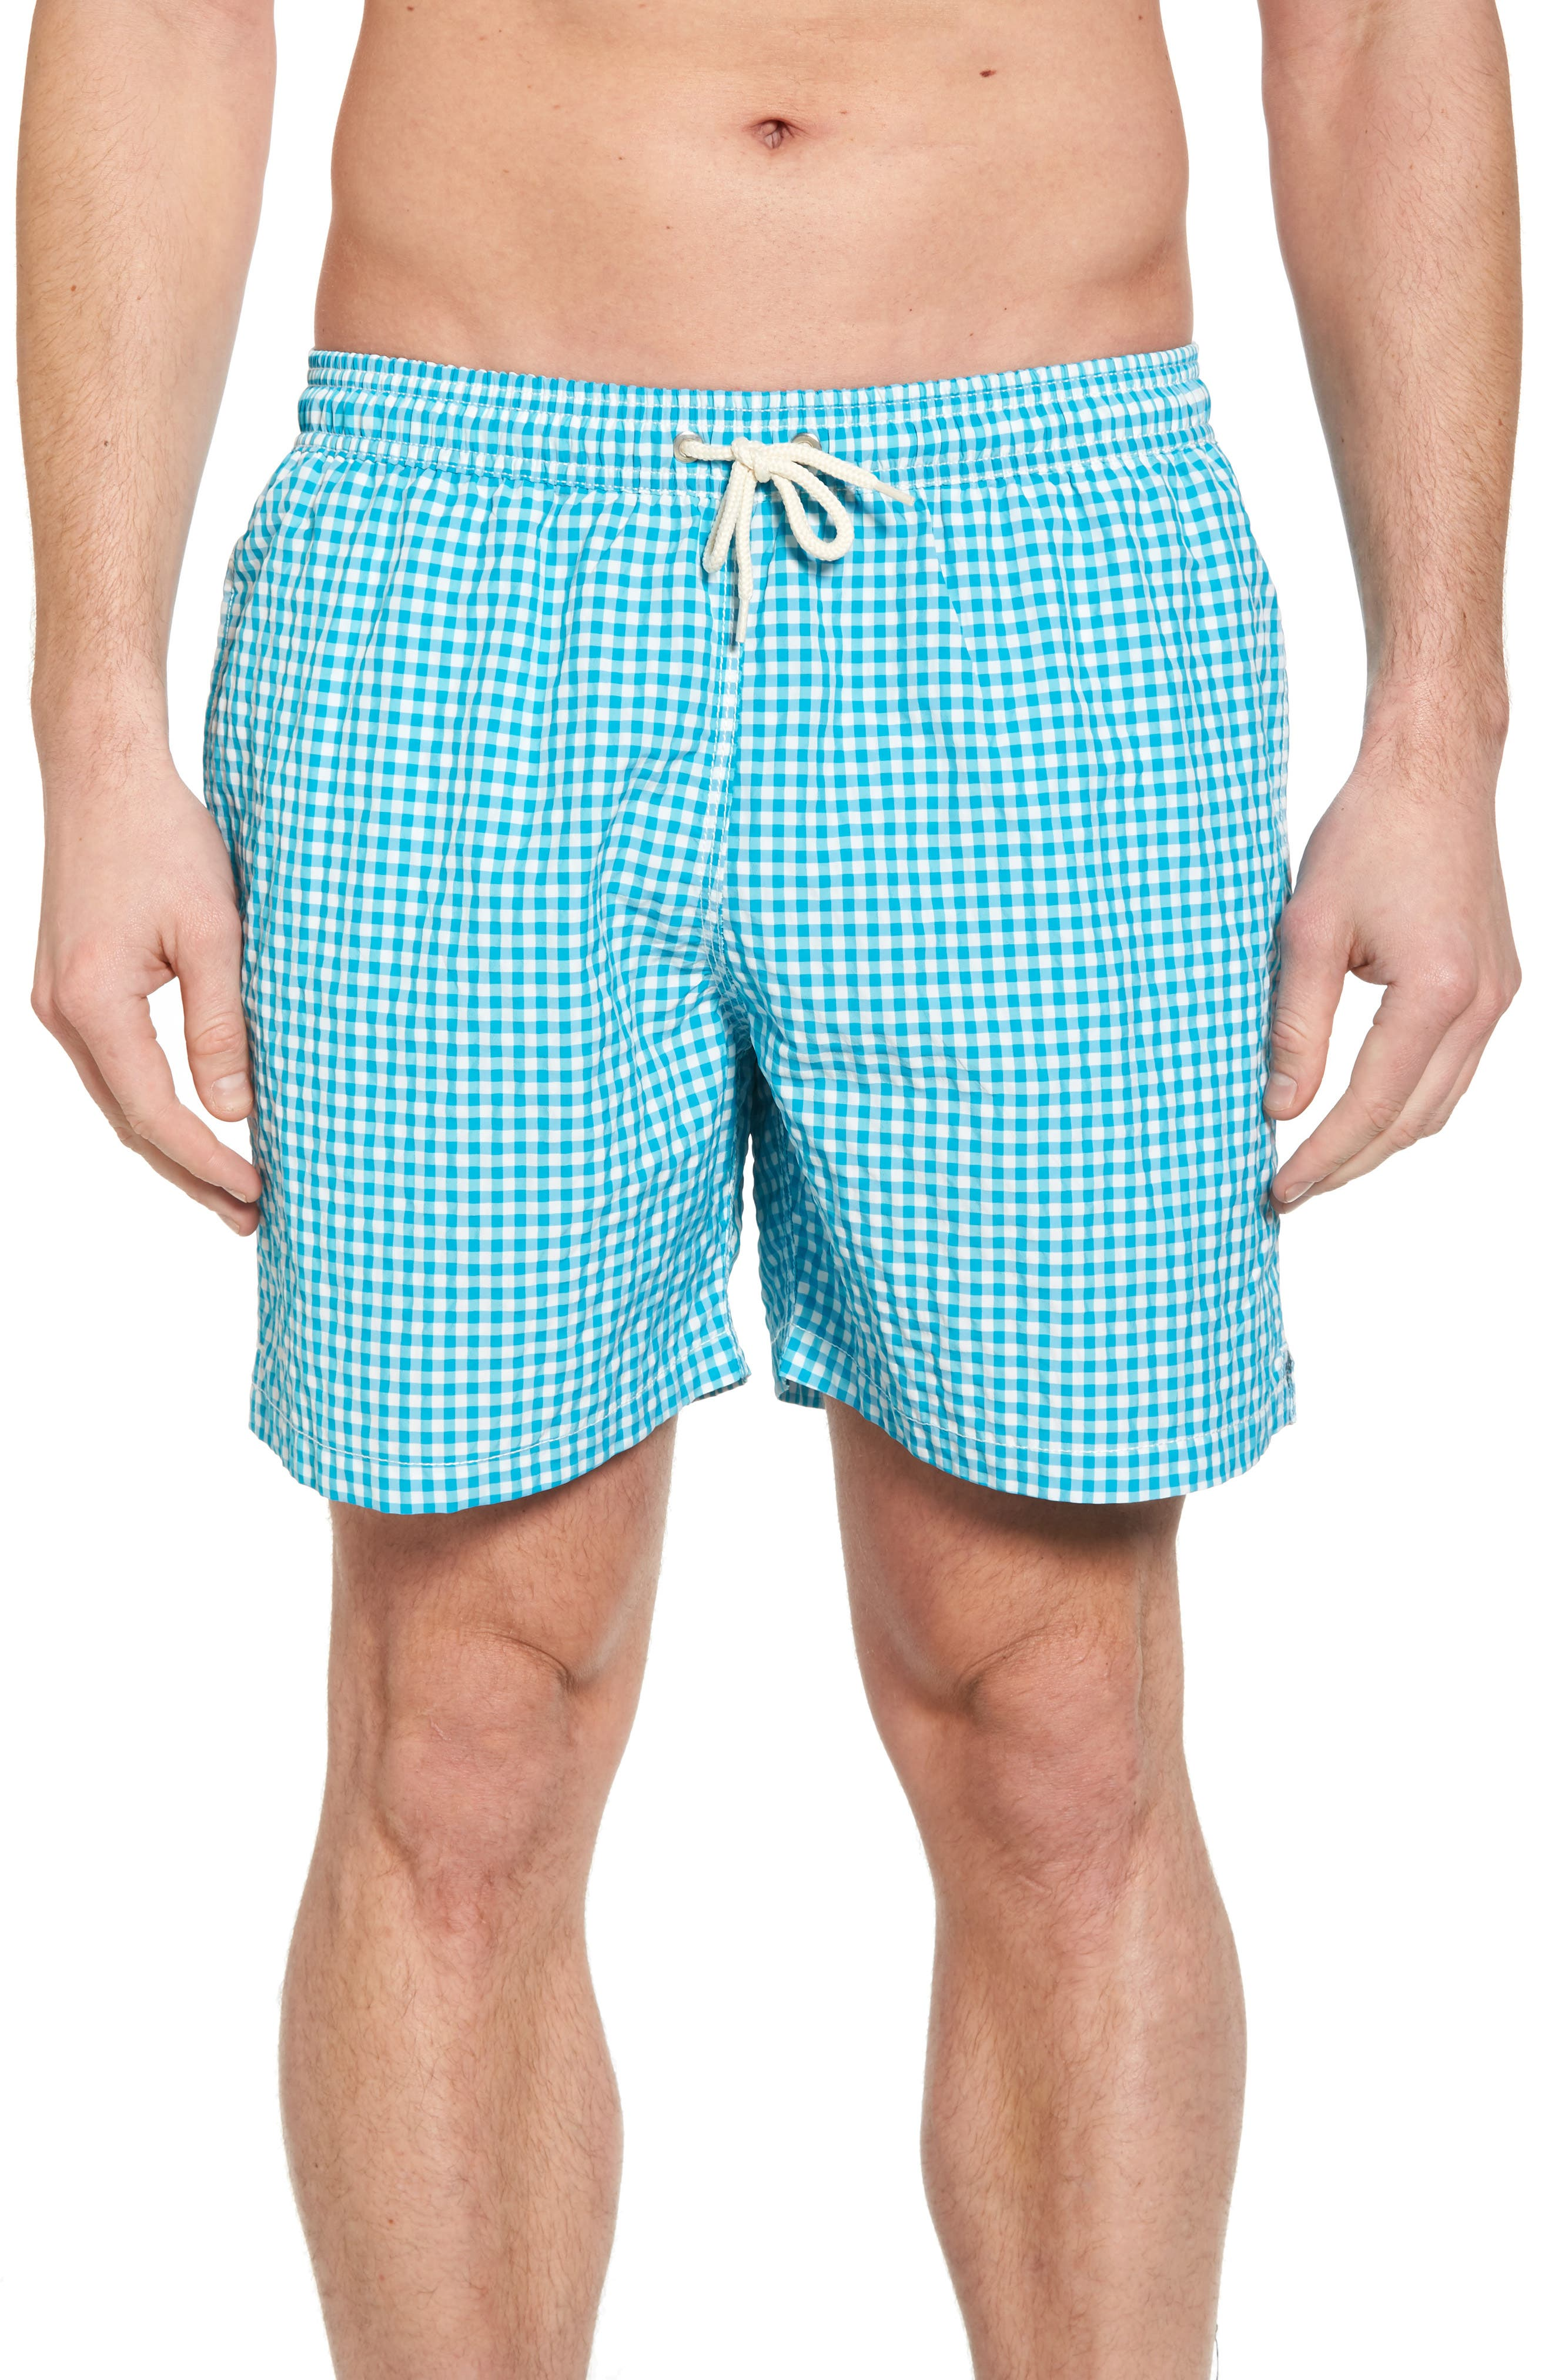 Gingham Check Swim Trunks,                         Main,                         color, 440